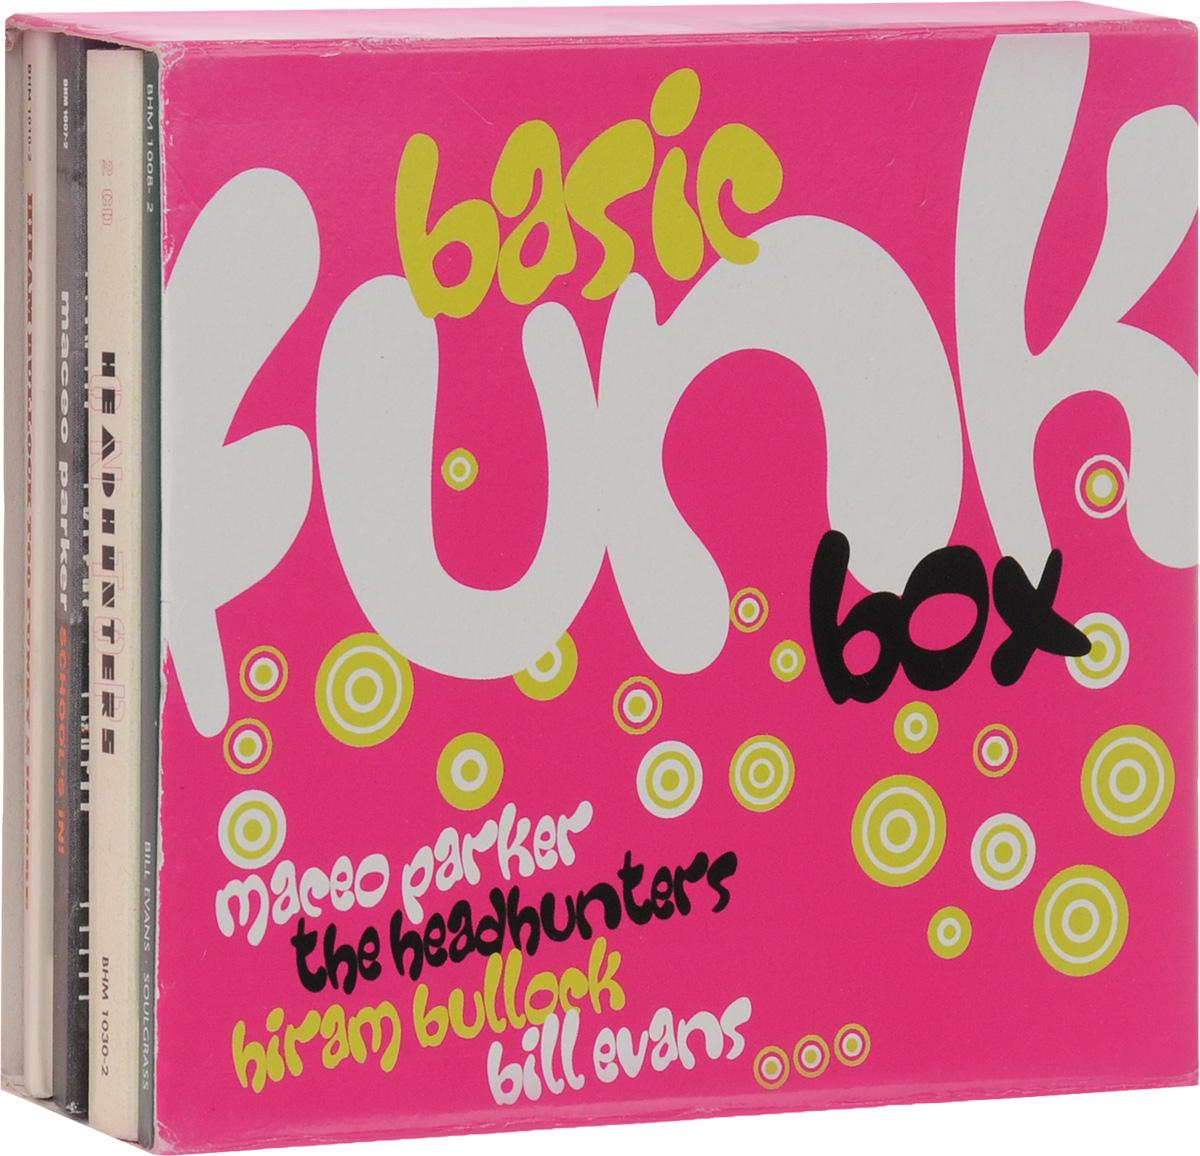 Билл Эванс,The Headhunters,Мэсио Паркер,Хирам Баллок Basic Funk Box (5 CD) эван паркер эванс питер филипп вачсман бэрри гай паул луттон лауренсе кассерлей вальтер прати марко векчи evan parker electro acoustic ensemble the moment s energy